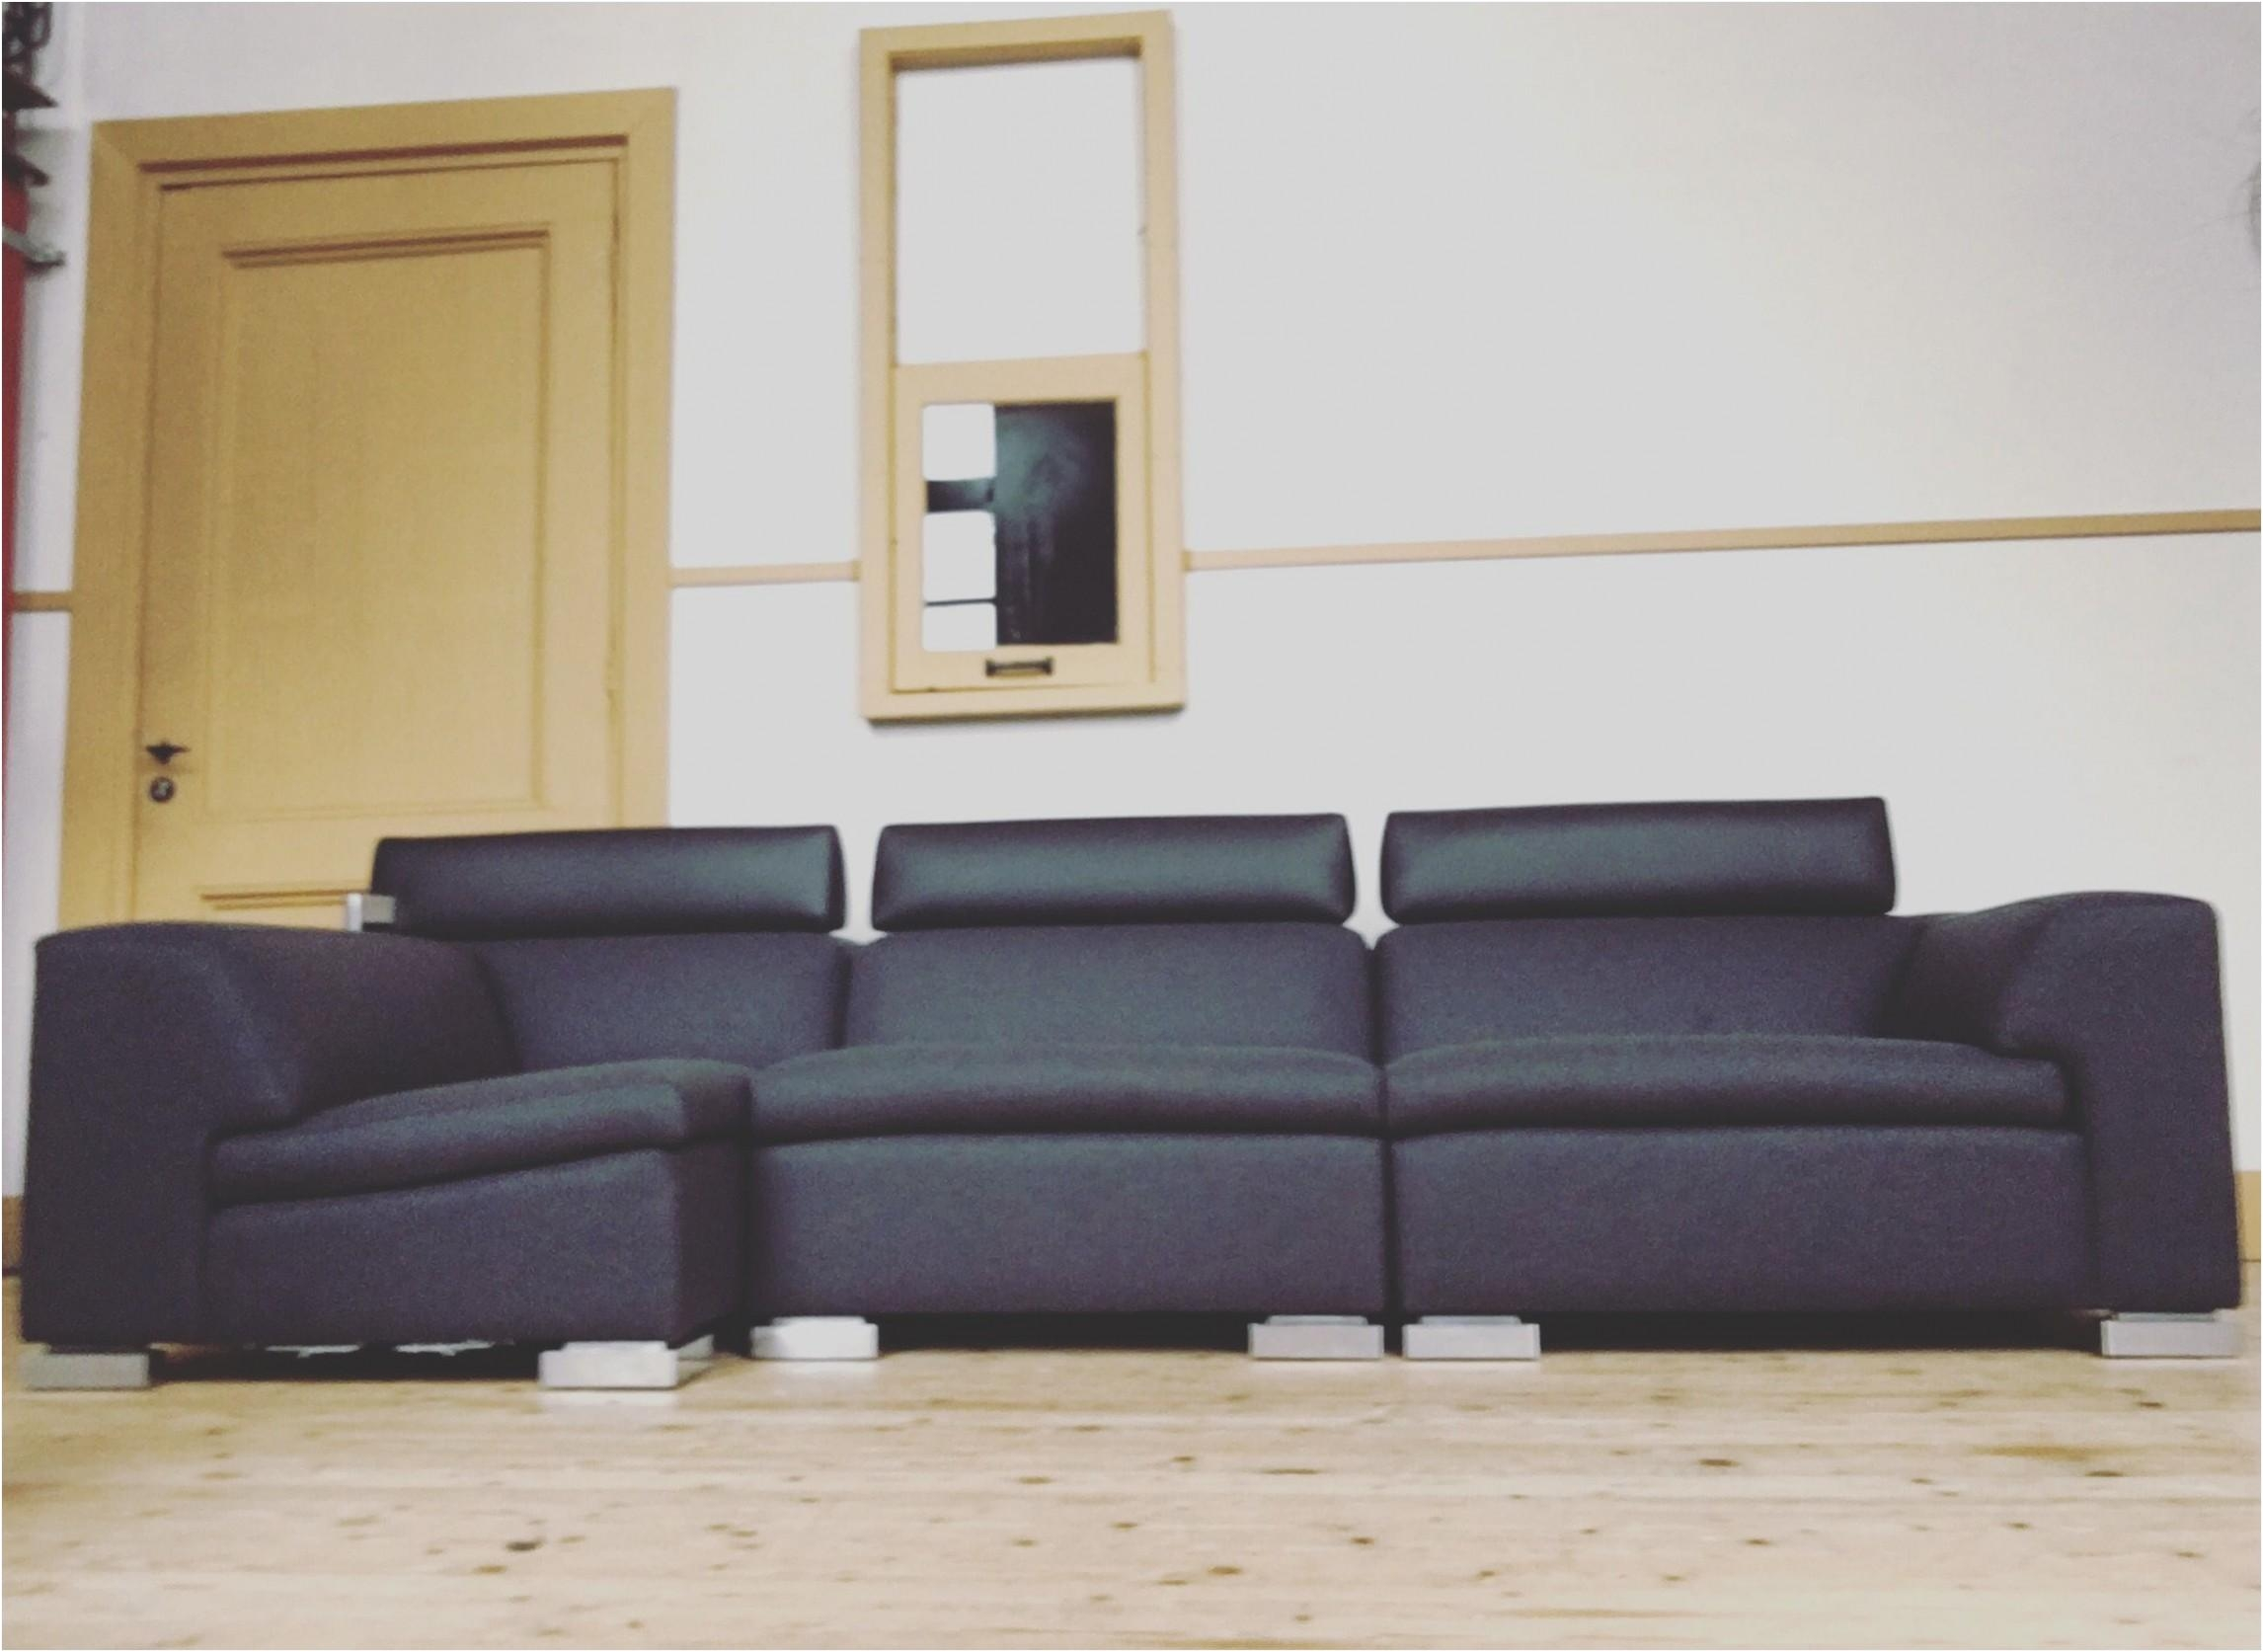 Kohls Rugs Outdoor Furniture Comforter Sets At Kohl S Lovely Kohl S